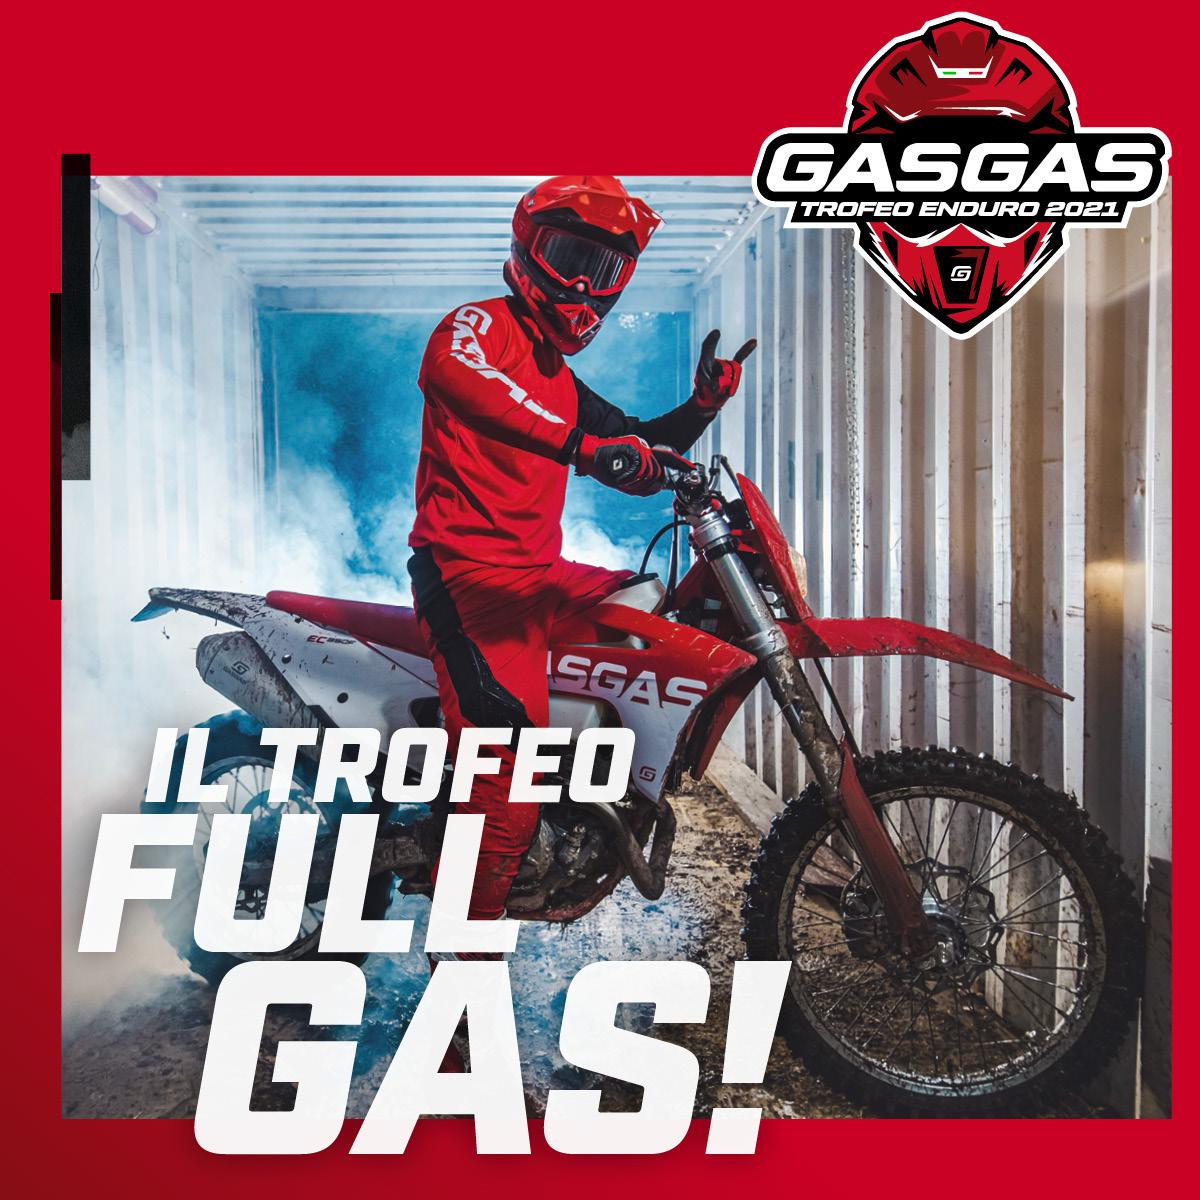 Trofeo Enduro GasGas Accendi l'entusiasmo 2021A